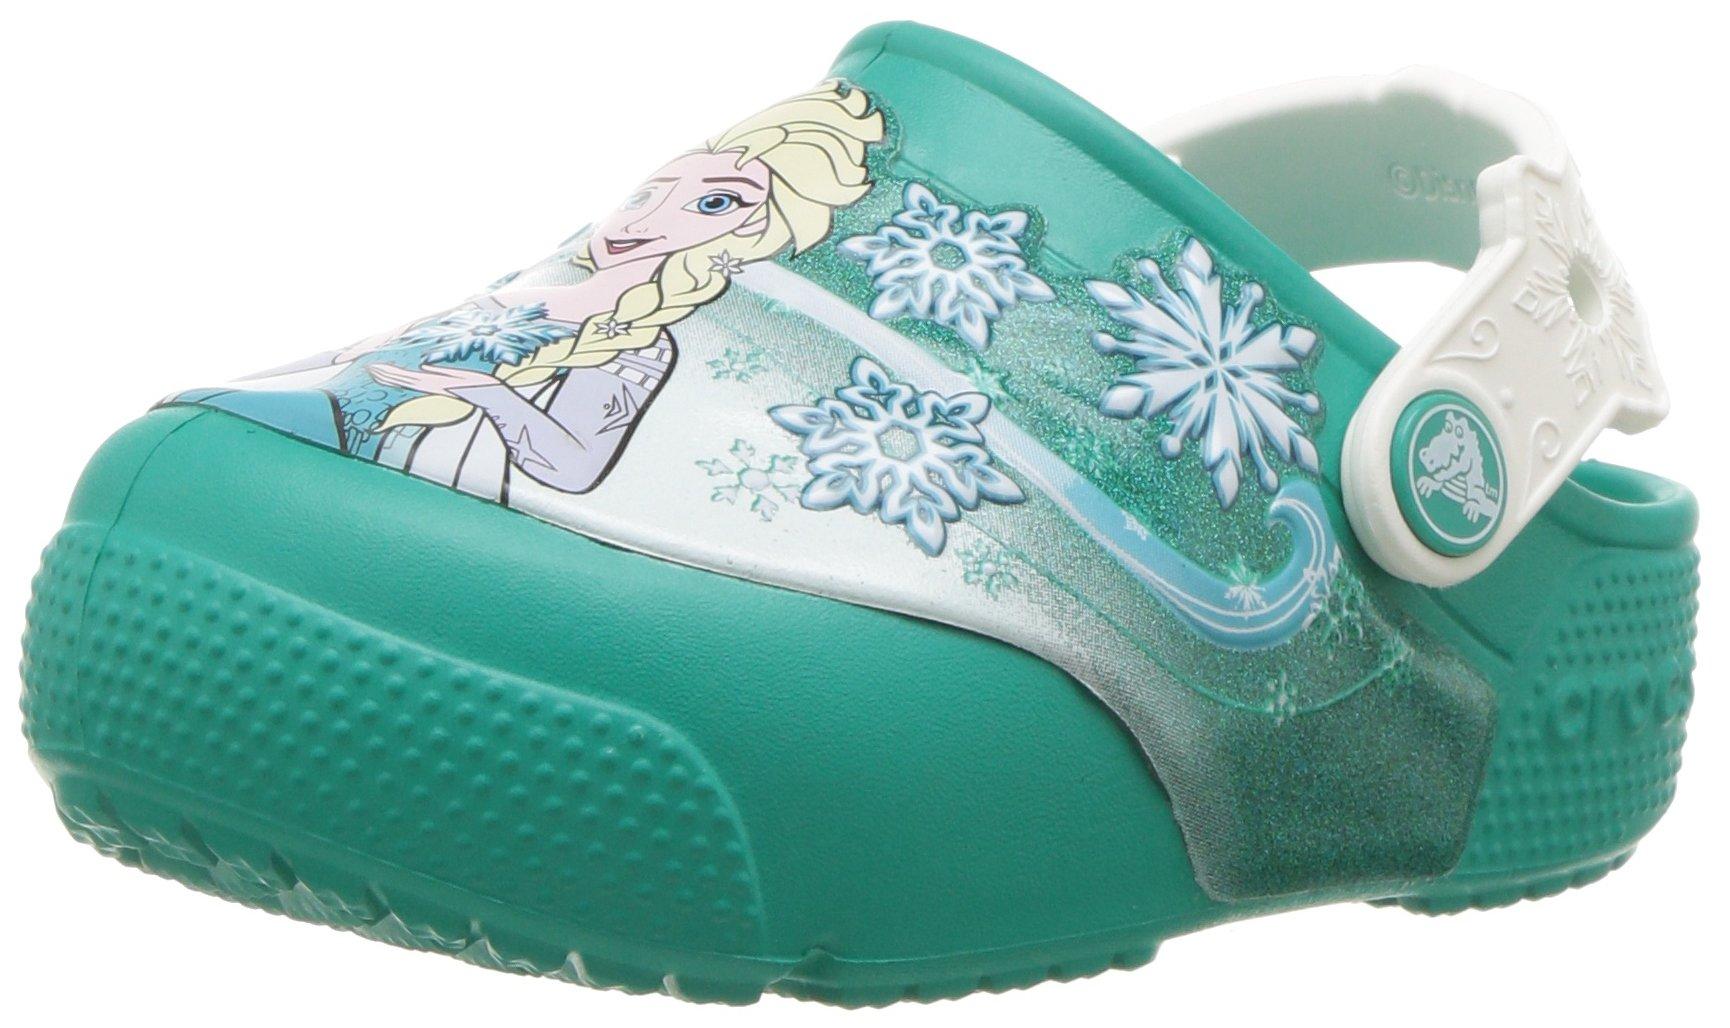 Crocs Girls' FL Frozen Lights K Clog, Tropical Teal, 11 M US Little Kid